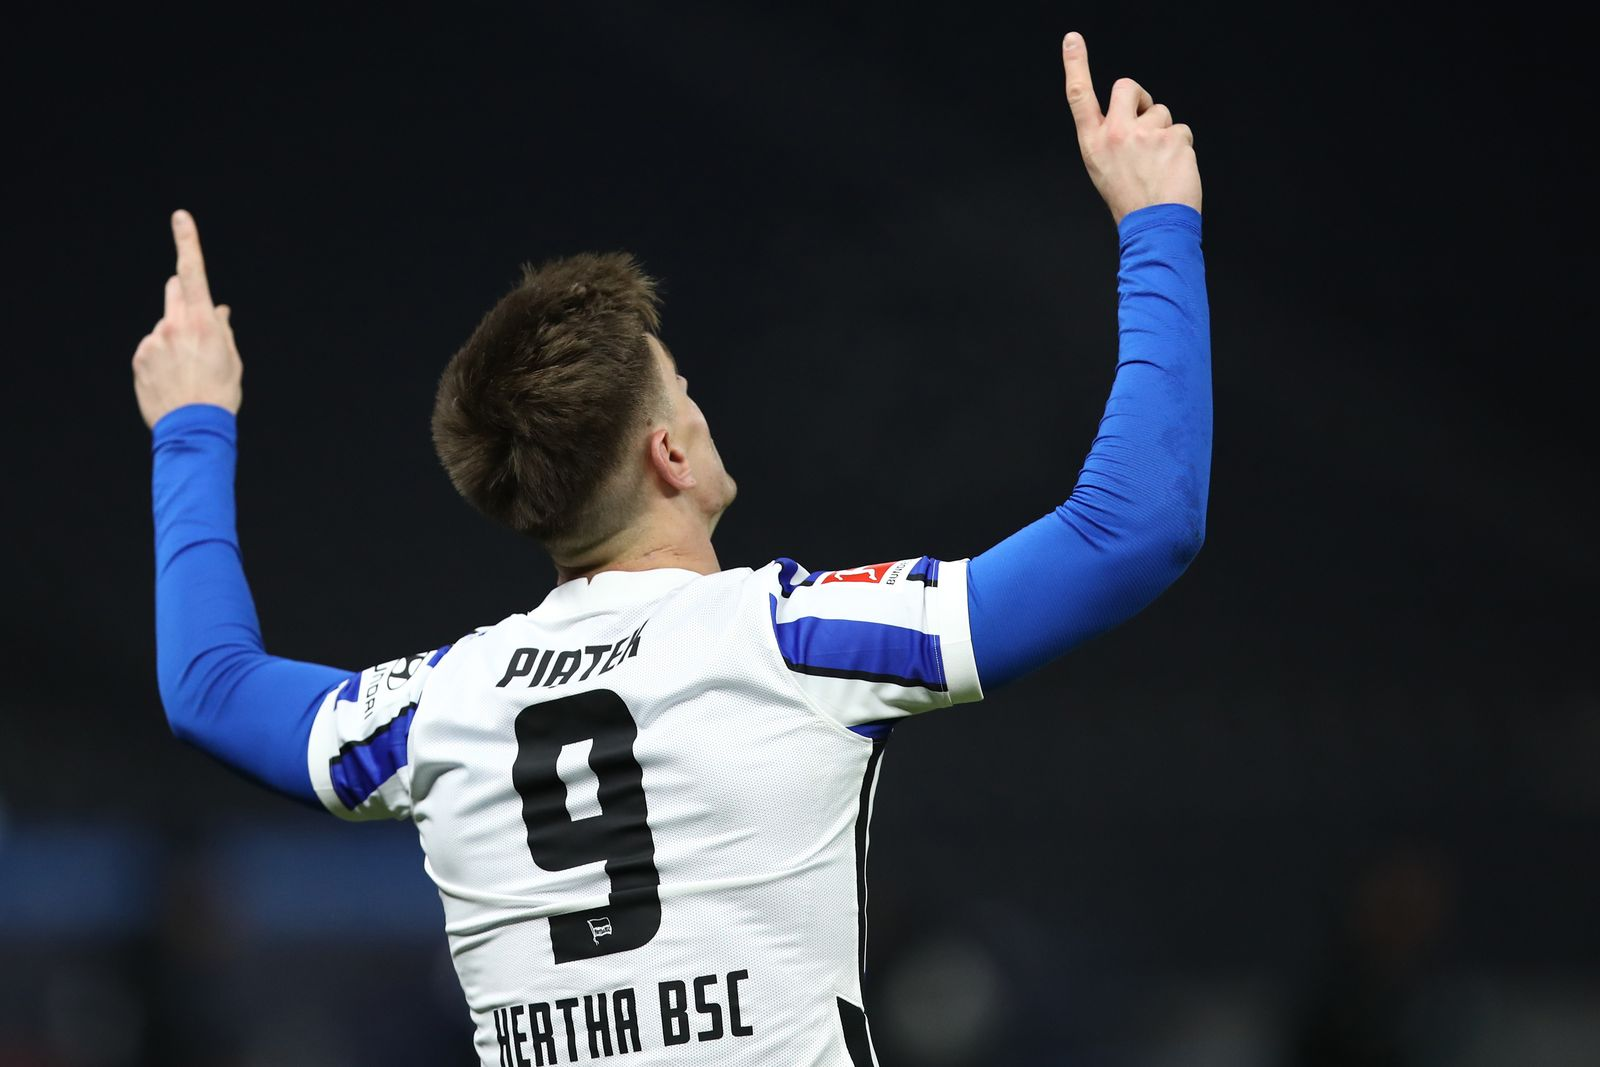 Hertha BSC v 1. FC Union Berlin, Germany - 04 Dec 2020